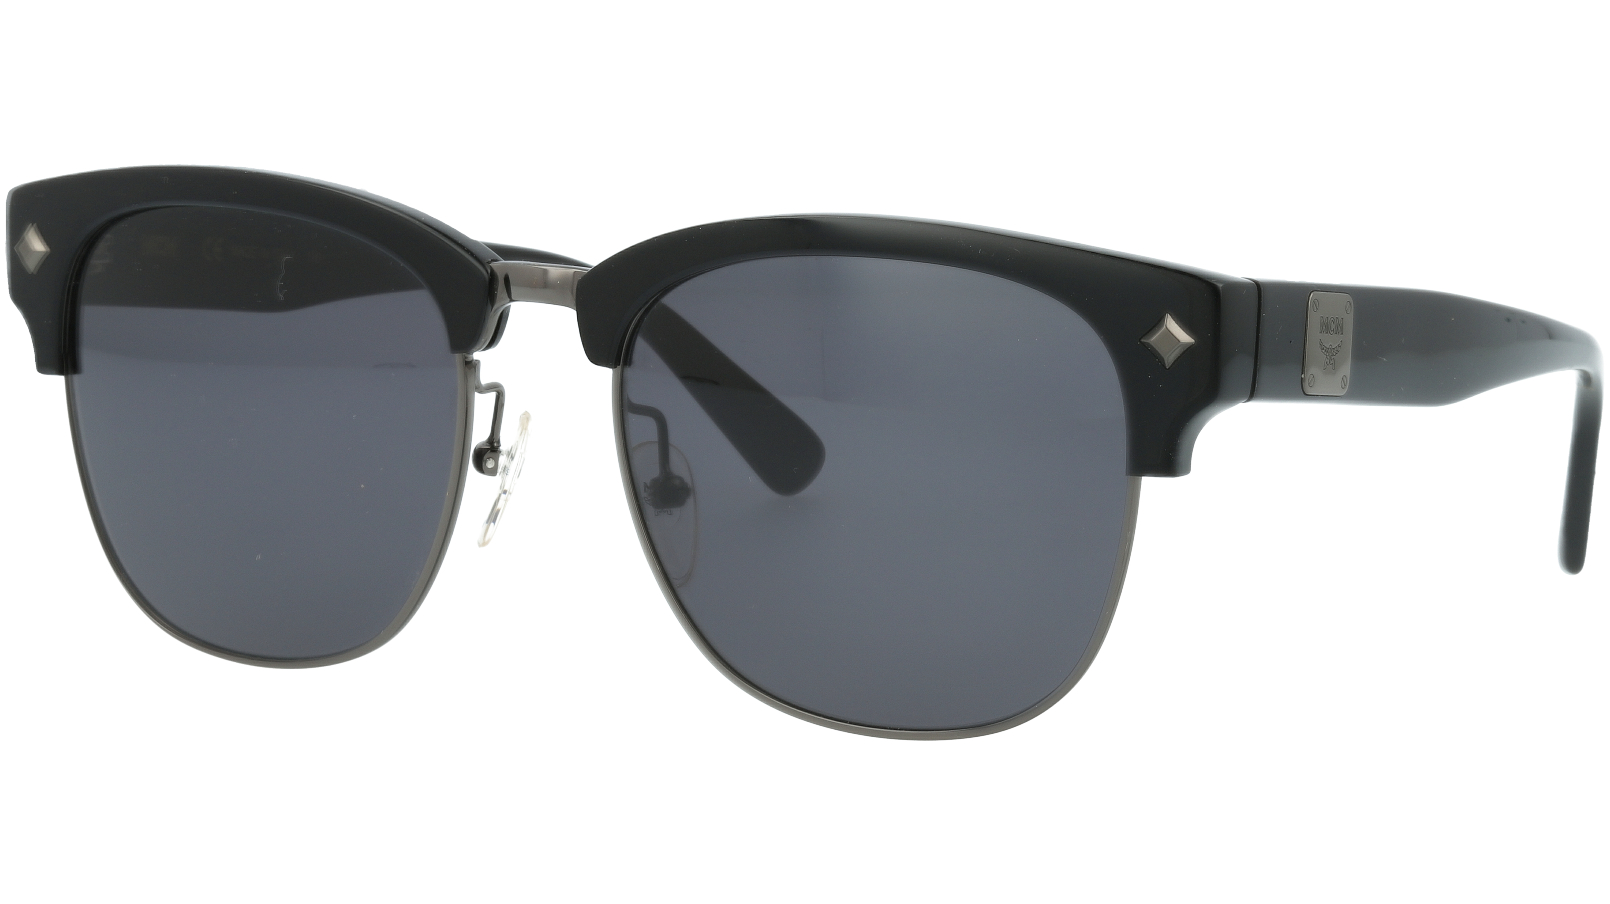 MCM MCM604S 016 55 SHINY Sunglasses